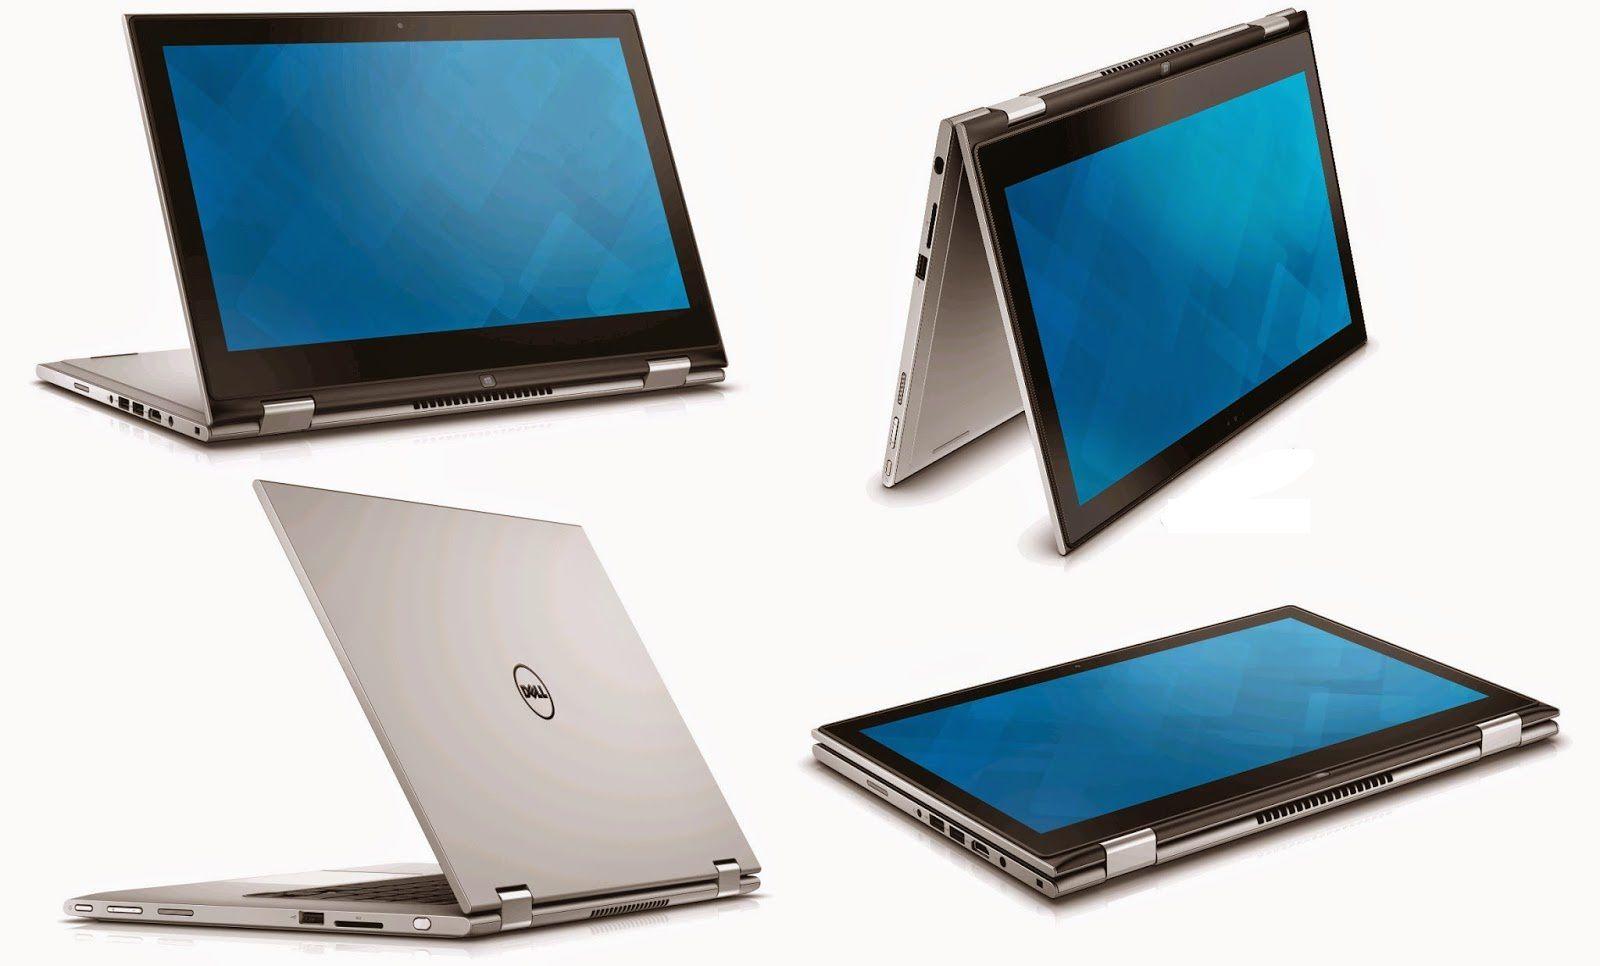 "Notebook Dell Inspiron 2 em 1 - Intel Core i7, 8GB de Memória, HD 500 + SSd 8GB, USB 3.0, Bluetooth 4.0, Tela 13.3"" Touchscreen Full HD Windows 10 - Seminovo"